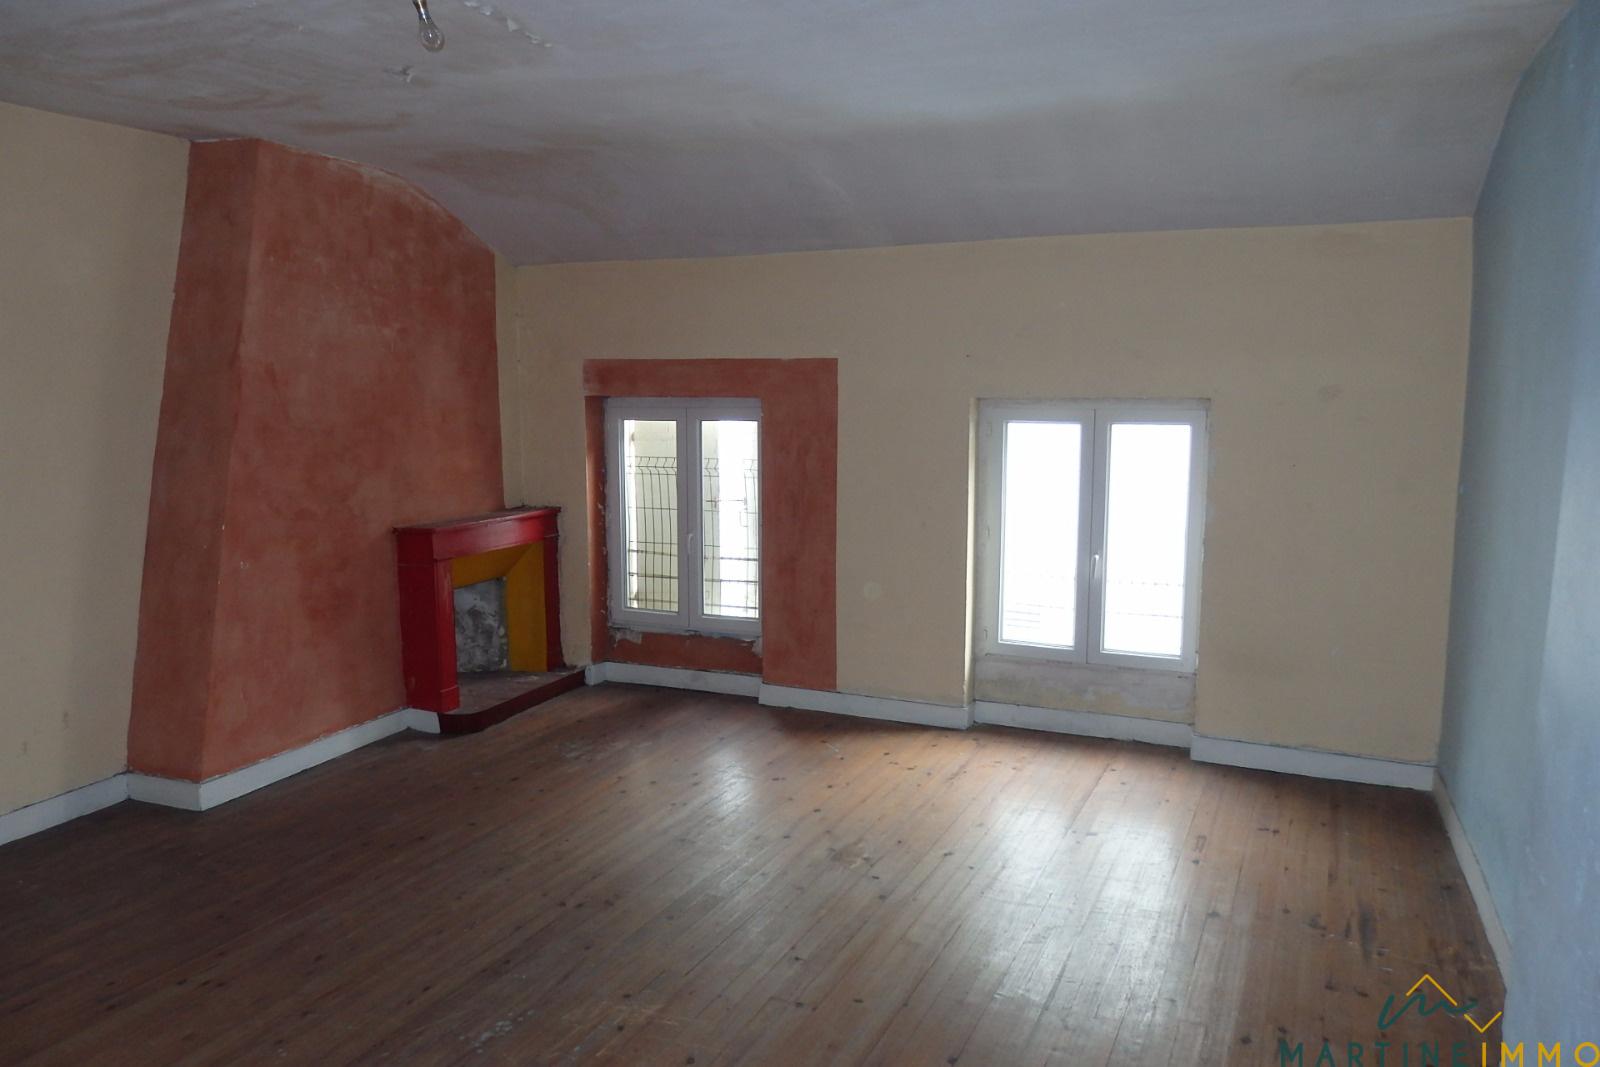 vente maison a vendre centre marmande. Black Bedroom Furniture Sets. Home Design Ideas